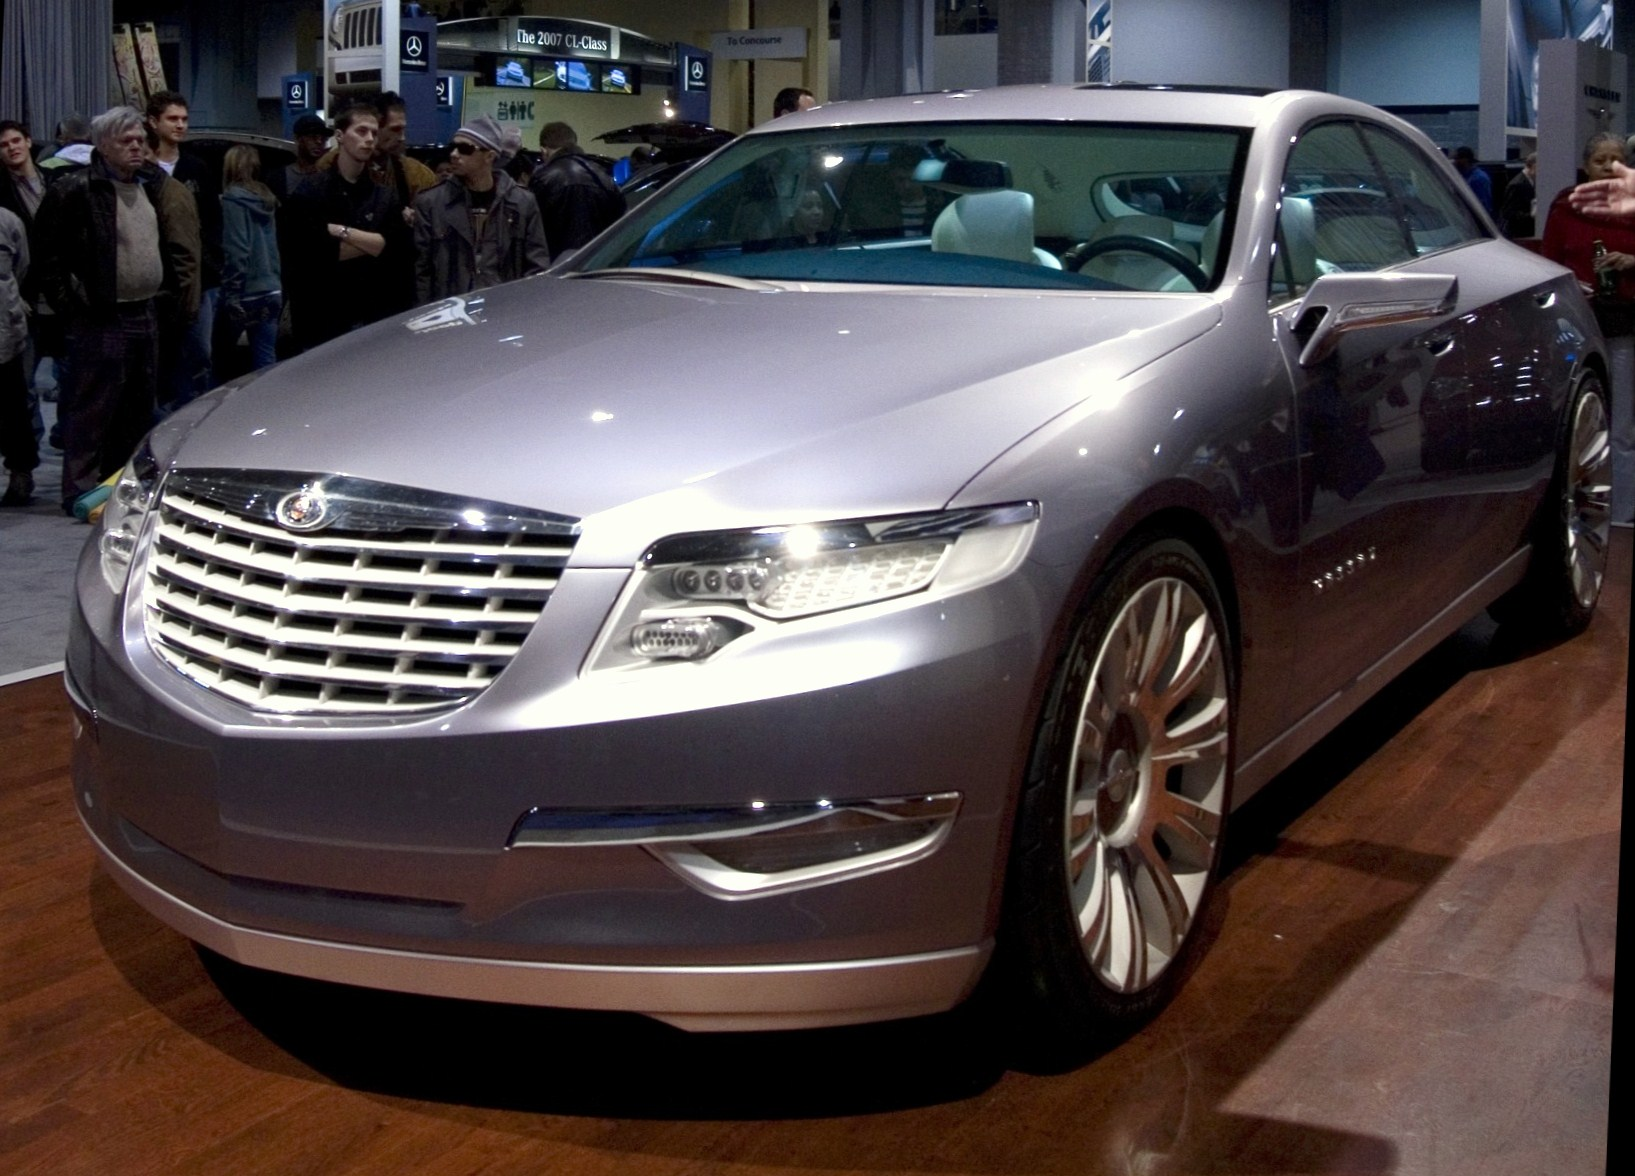 Chrysler nassau concept #1